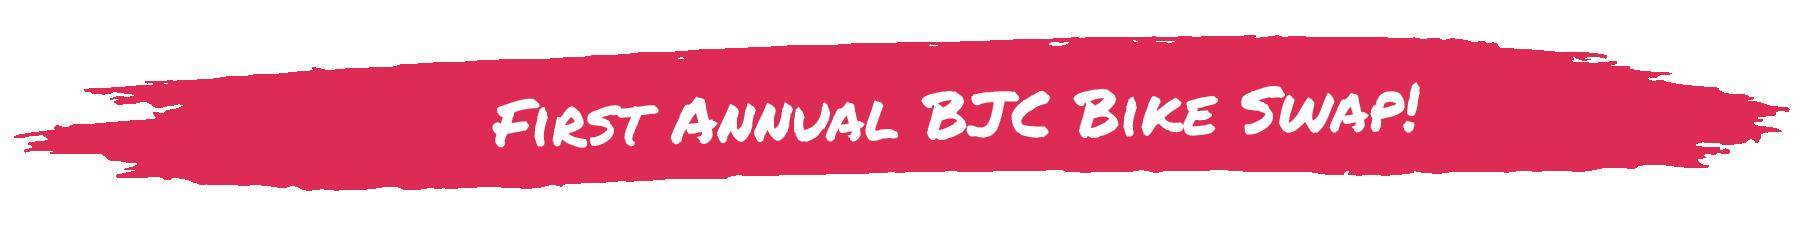 BJC Bike Swap Banner.png